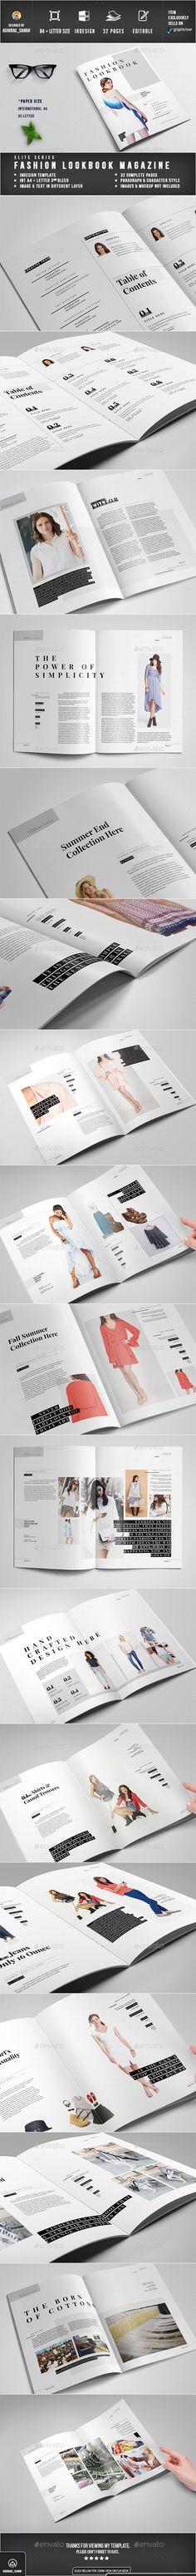 Minimal Portfolio Brochure INDD Template InDesign Template - fashion design brochure template